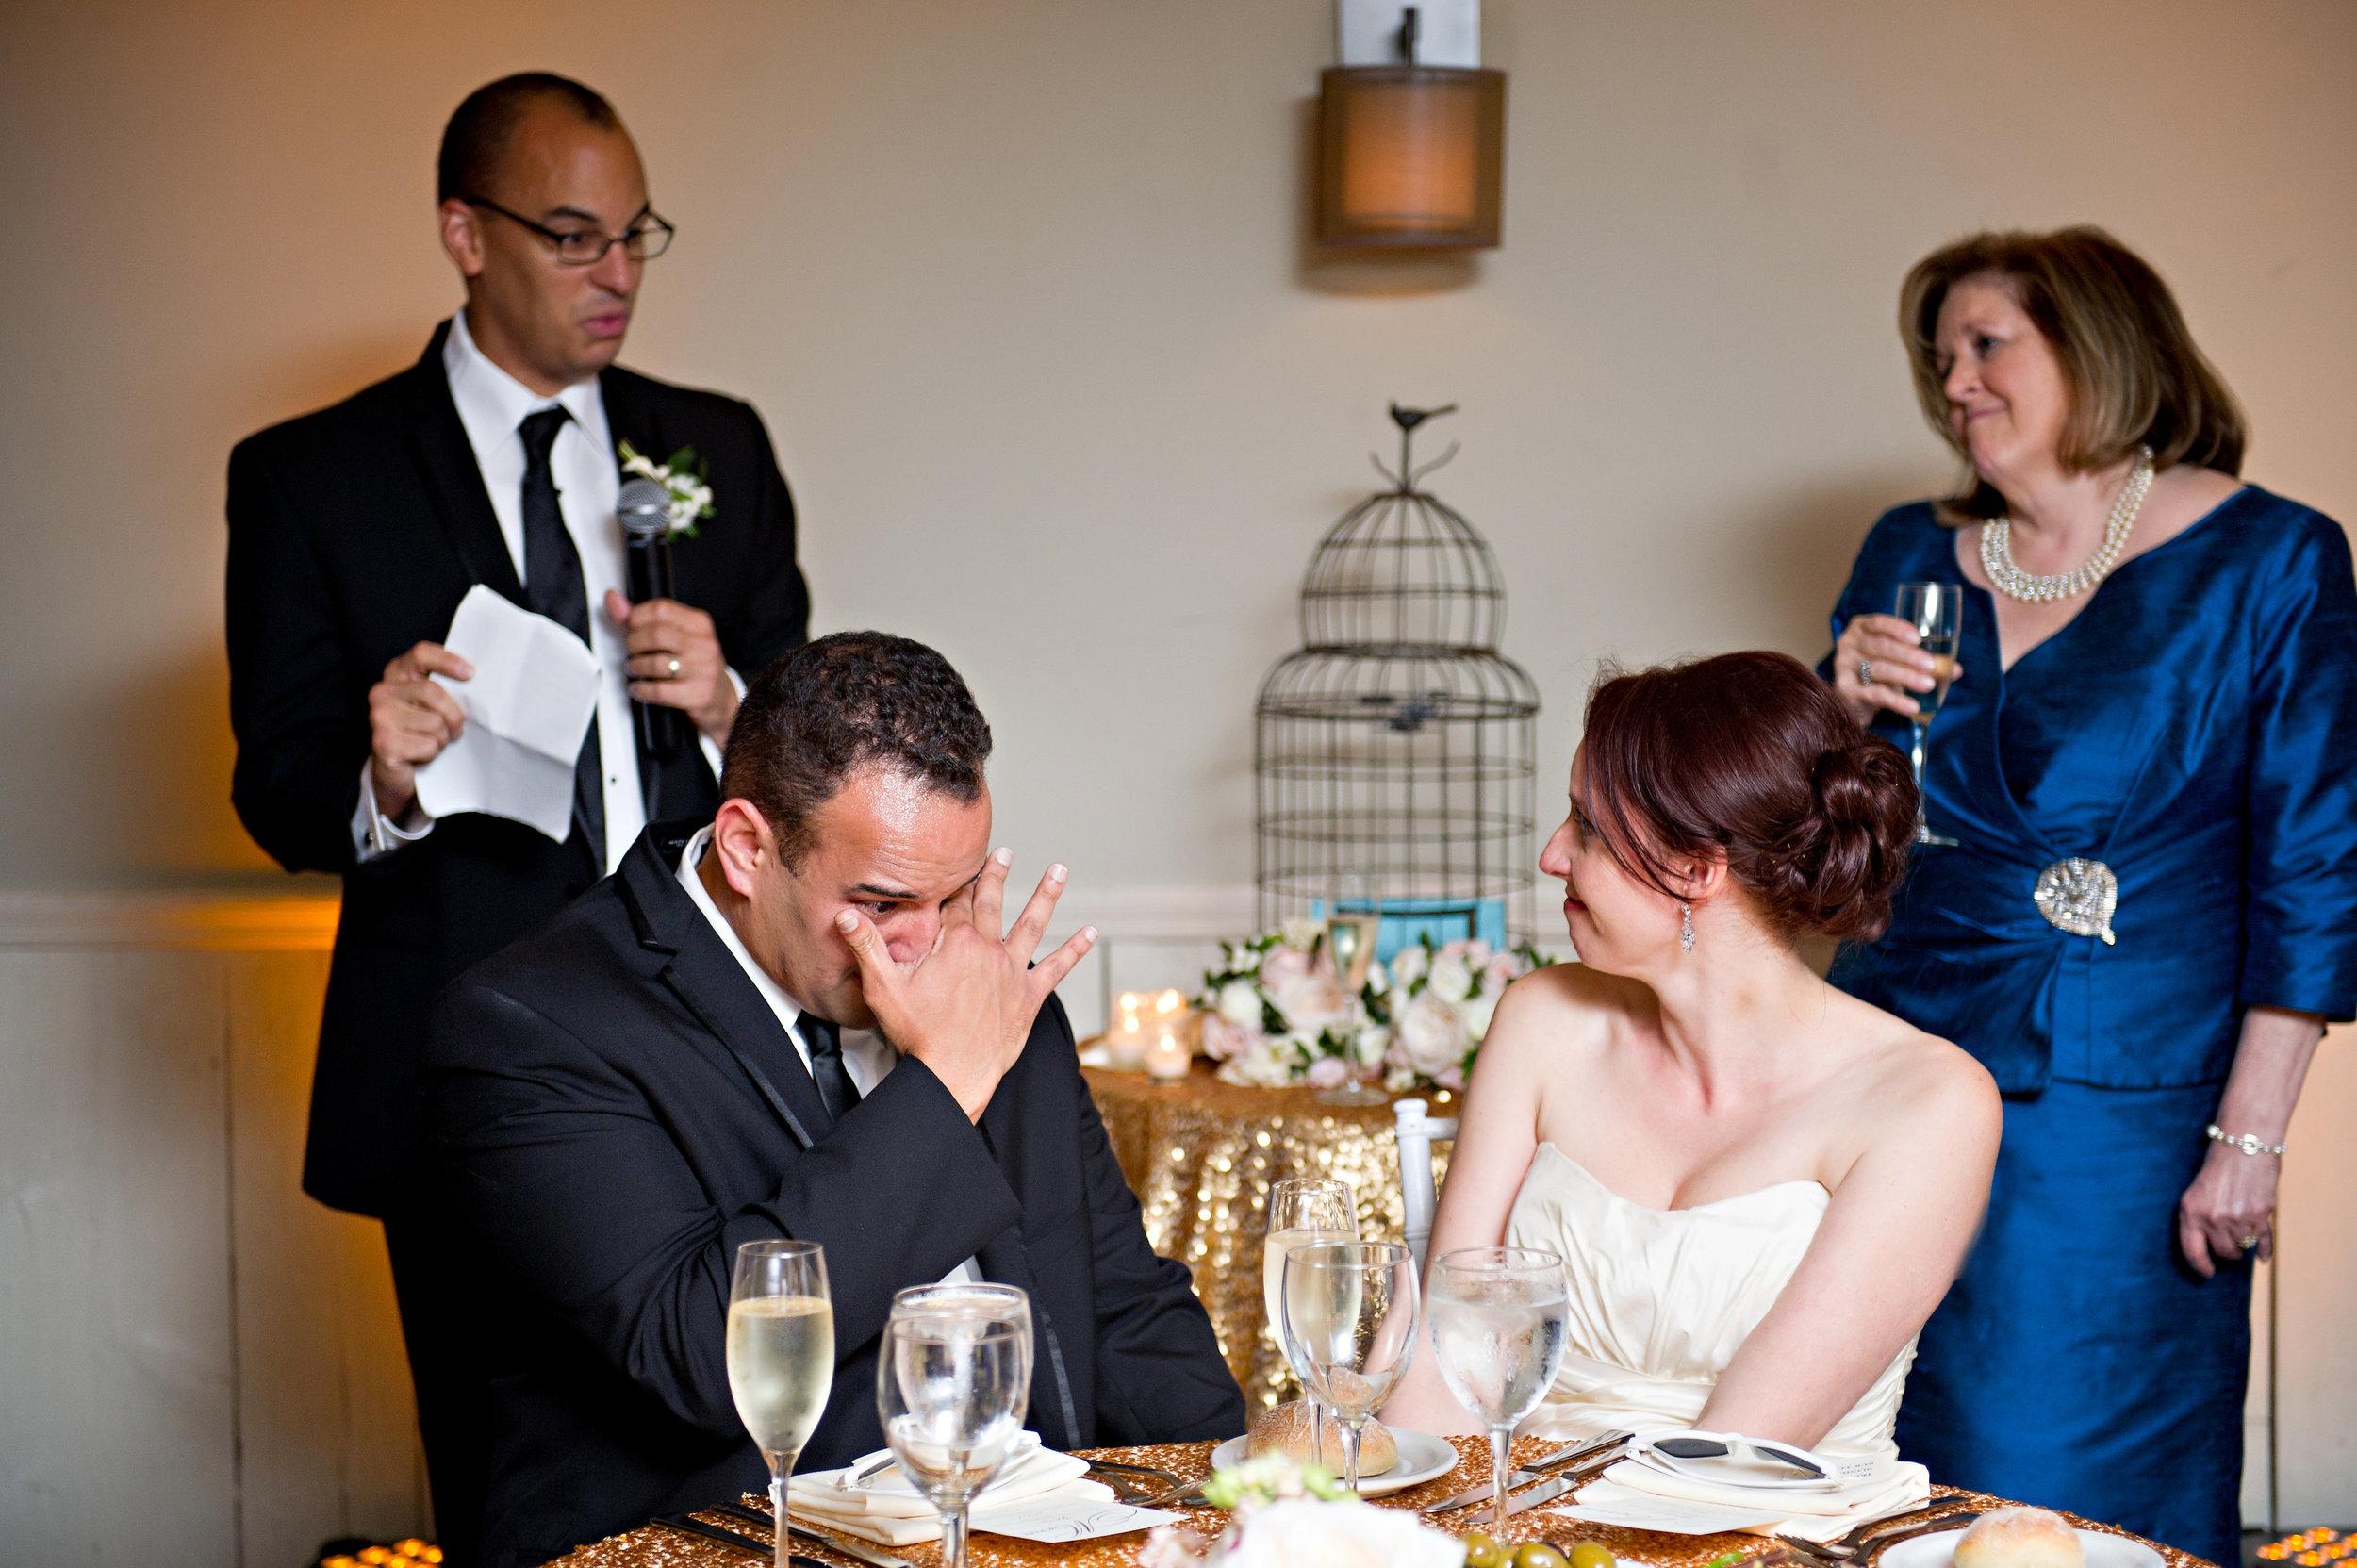 CT_Wedding_Planner_Crabtree_Kittle_House048.jpg